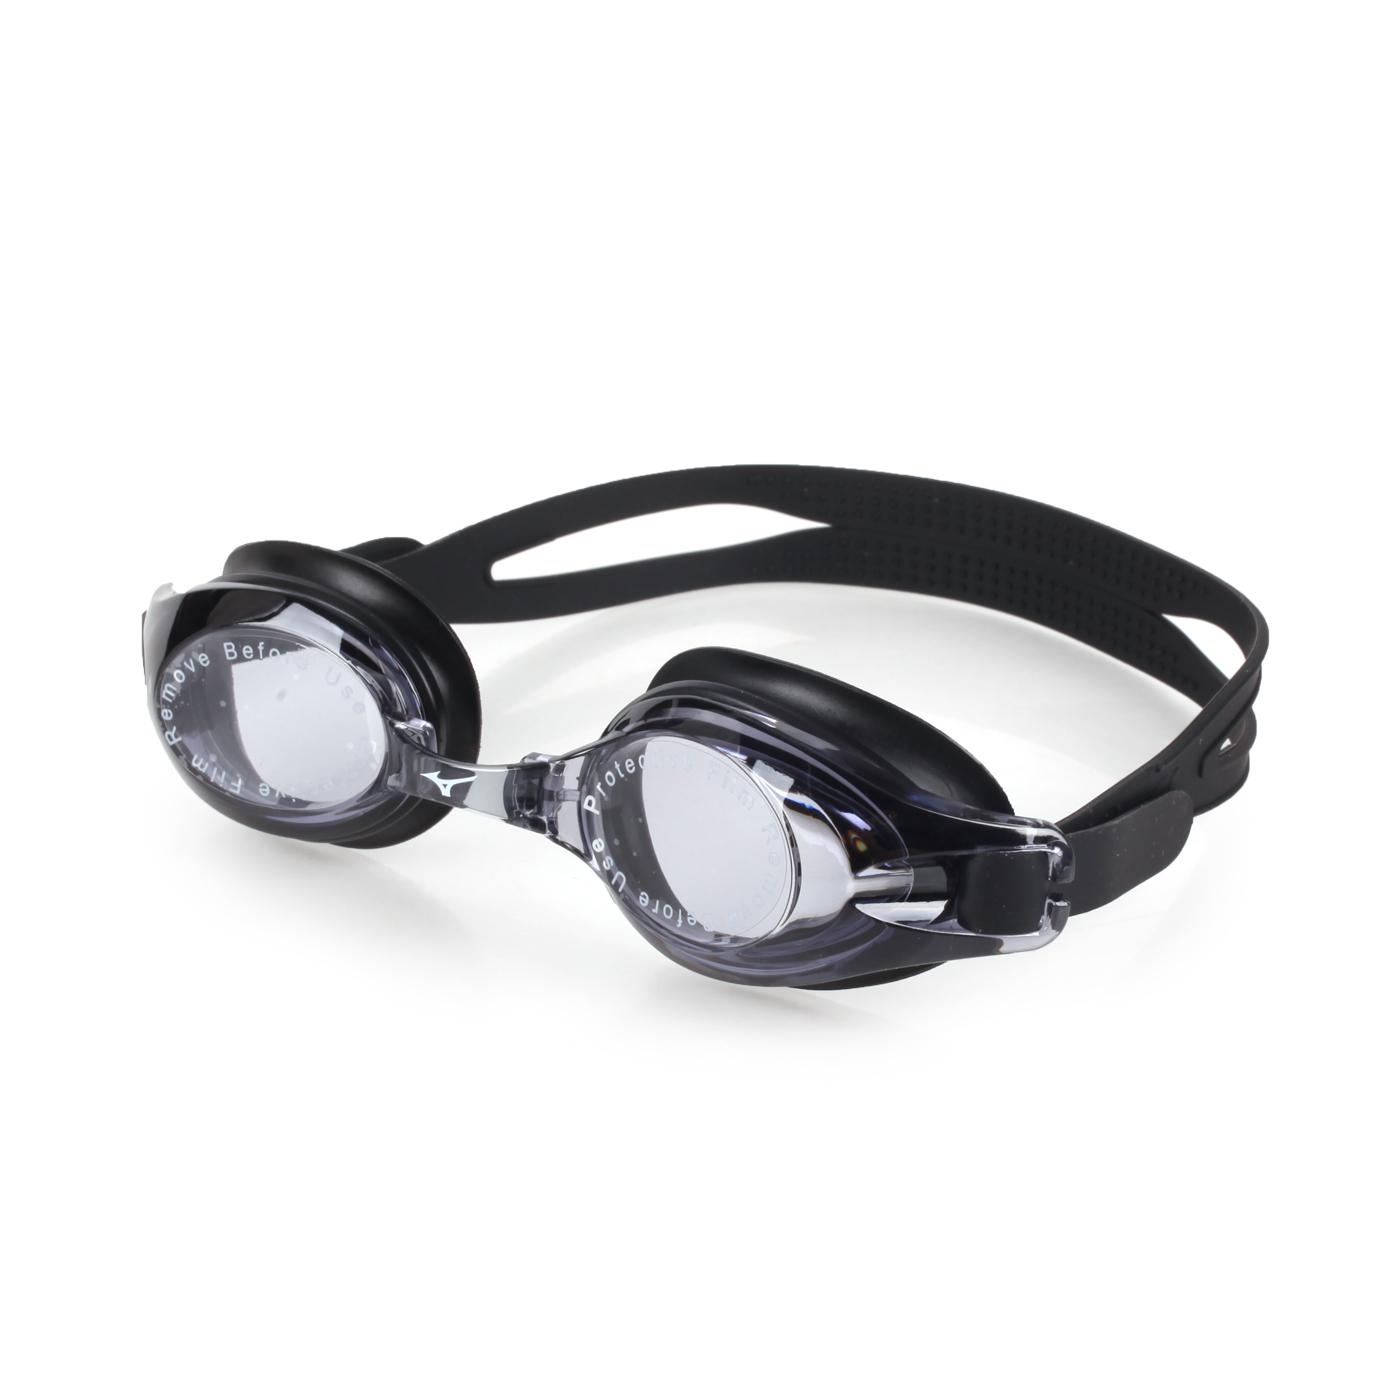 MIZUNO 泳鏡  SWIMN3TE702000-09 - 黑